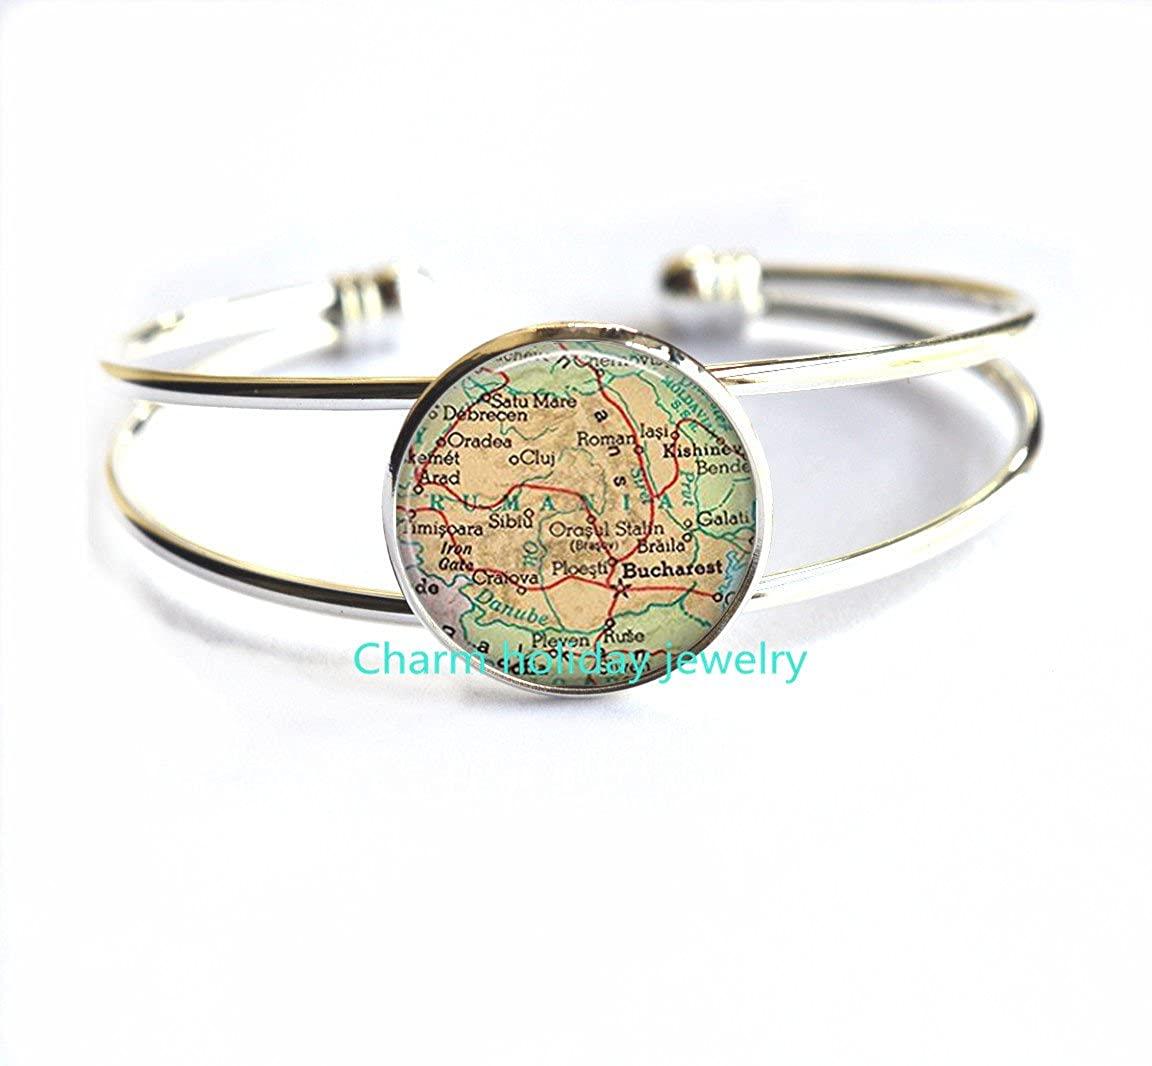 Romania map Bracelets, Romania map Bracelet, Romania Bracelets, Charming map Jewelry.D0109